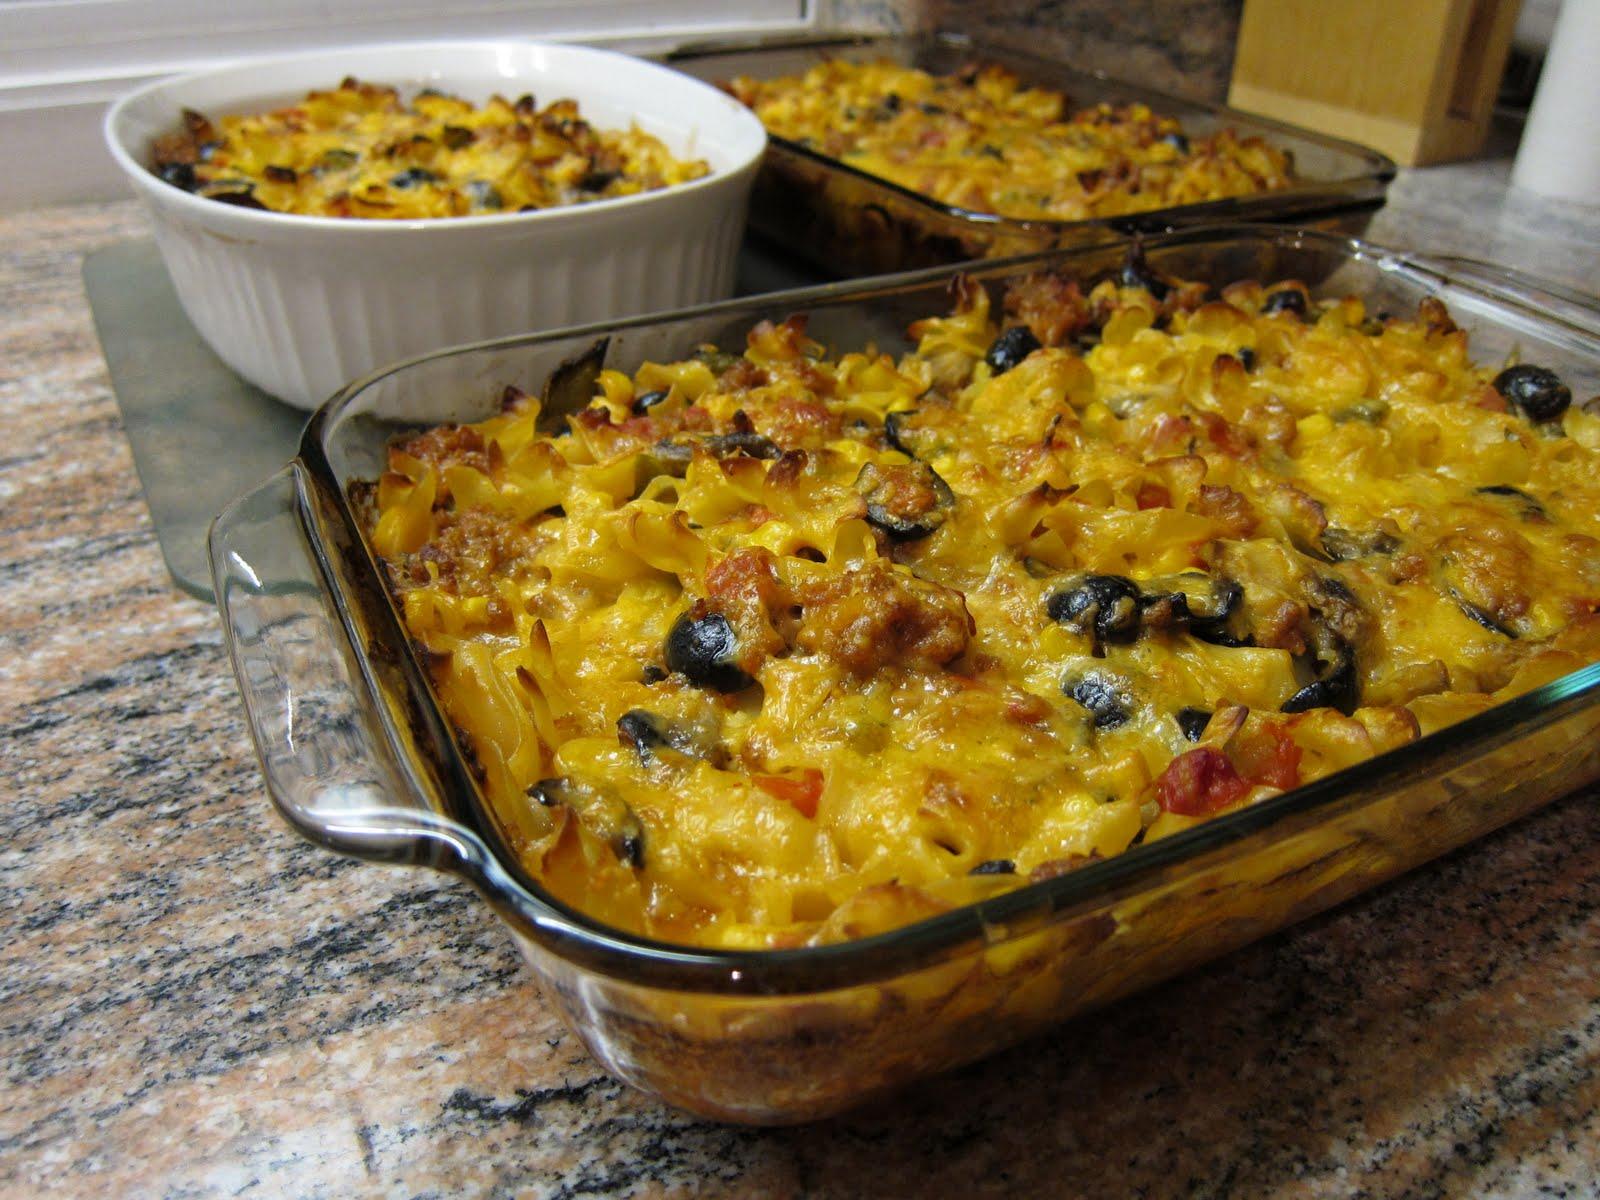 http://simplyrecipes.com/recipes/talerine_beef_casserole/